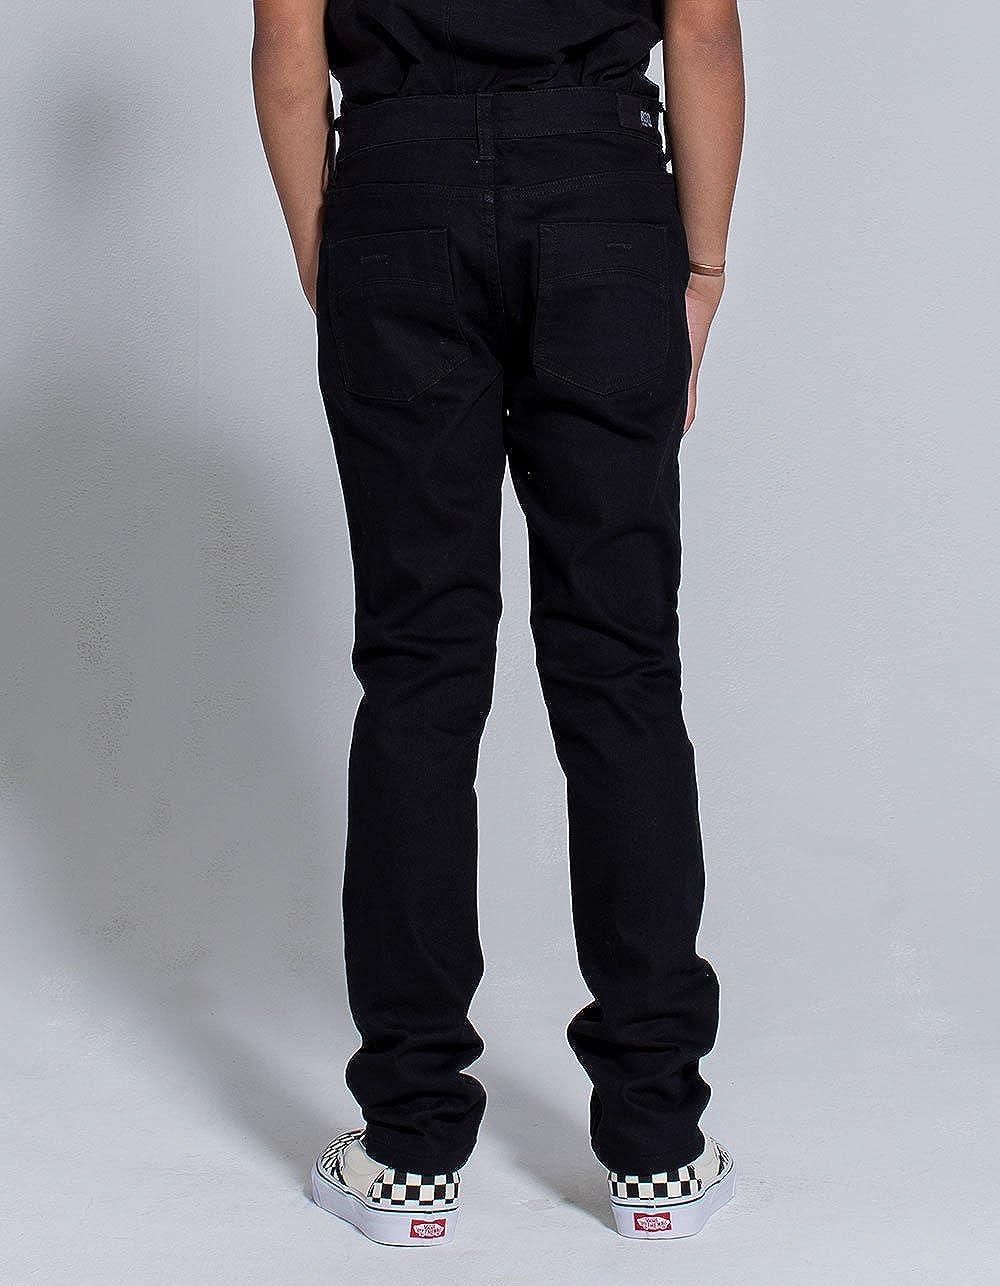 Rsq Tokyo Super Skinny Stretch Boys Jeans 302160